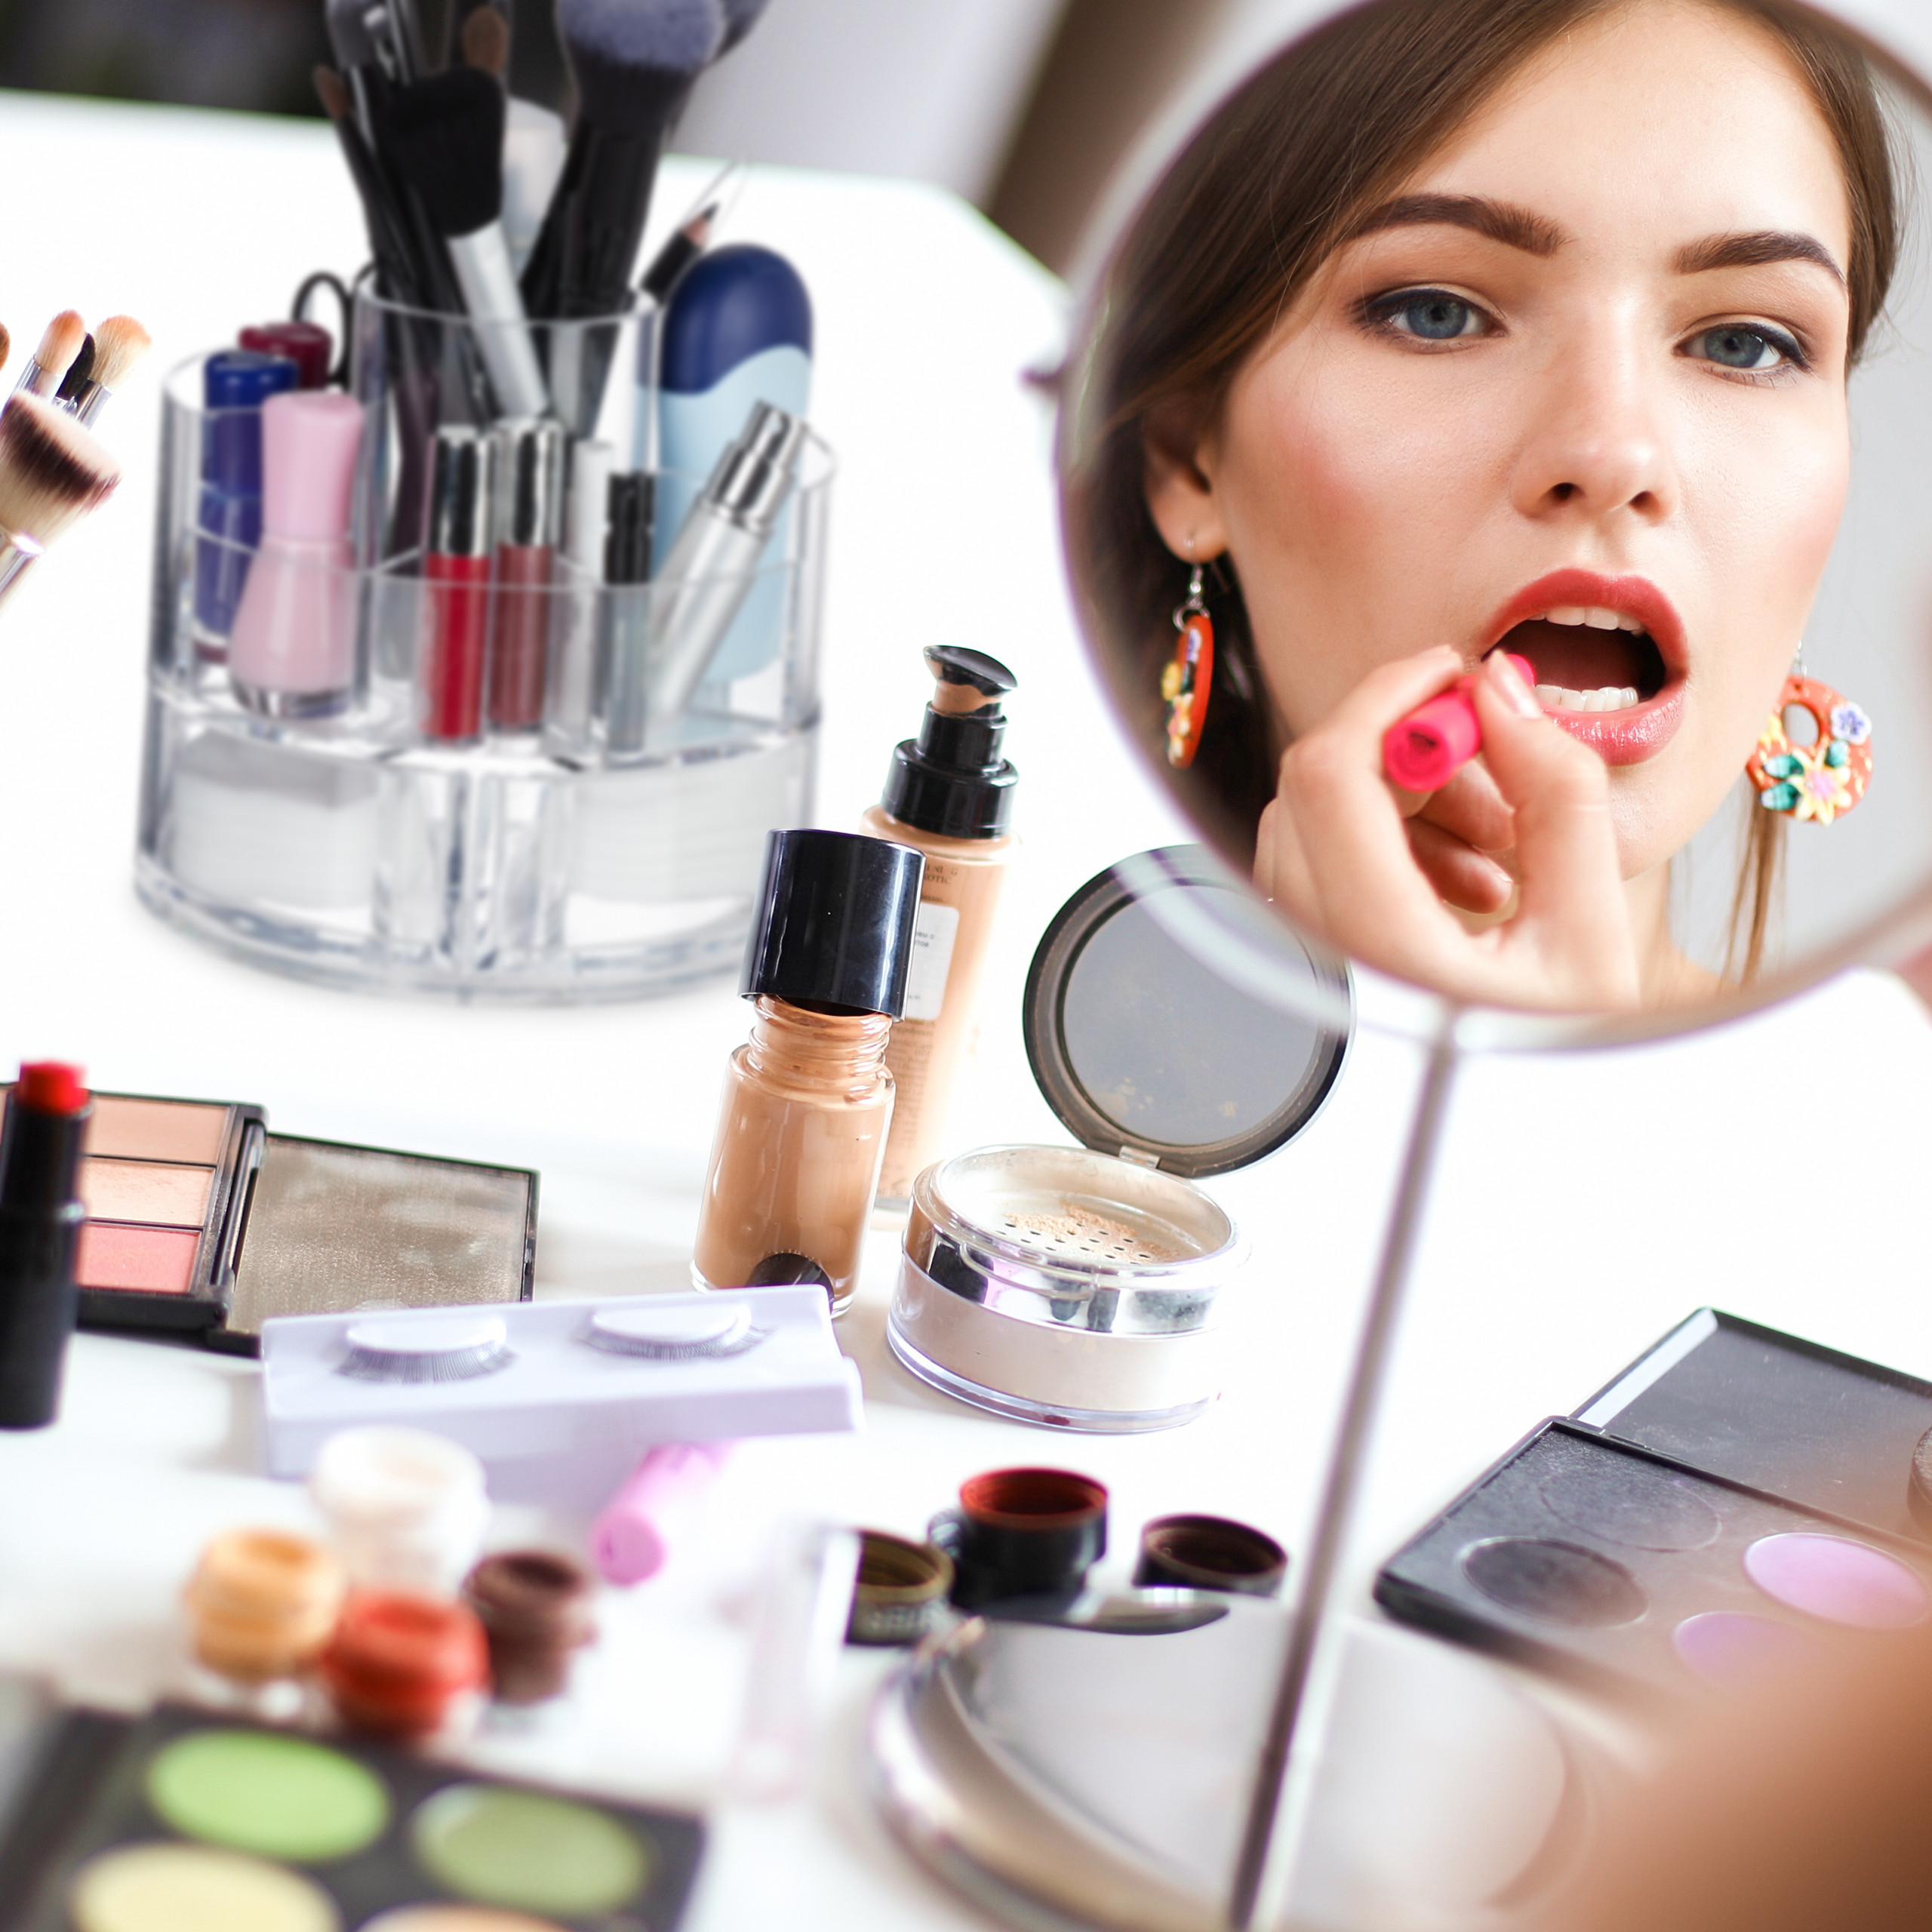 make-up-organizer-acryl-rond-cosmetica-opbergen-opbergsysteem miniatuur 12